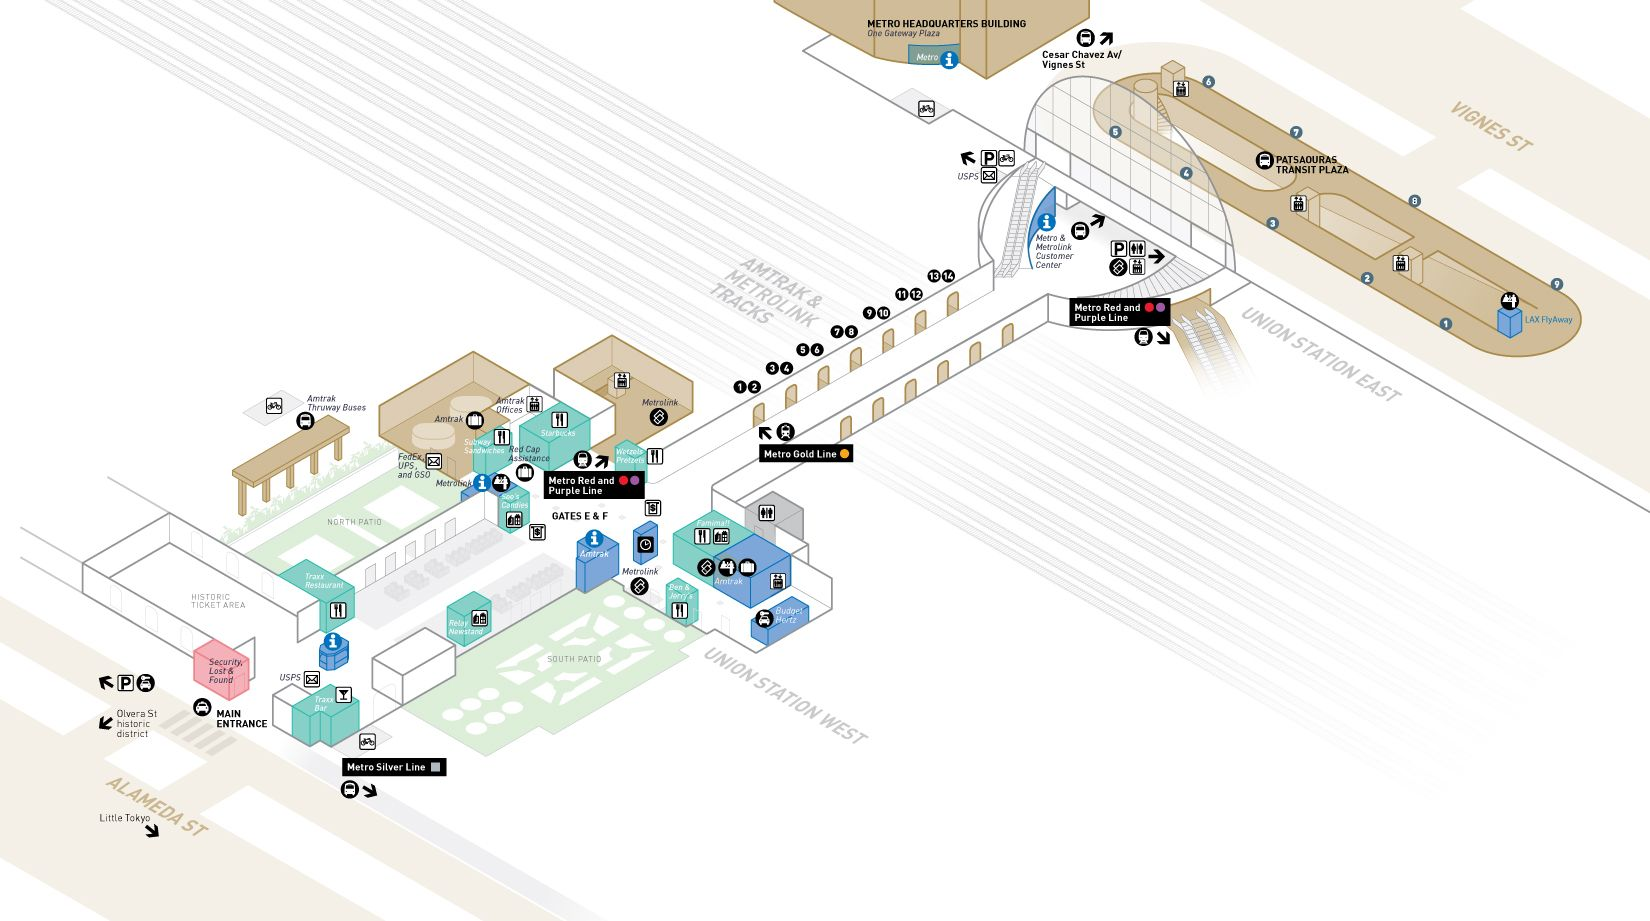 Los Angeles Union Station Map Pin by Sira F on Transit & Transport & Logistics | Union station